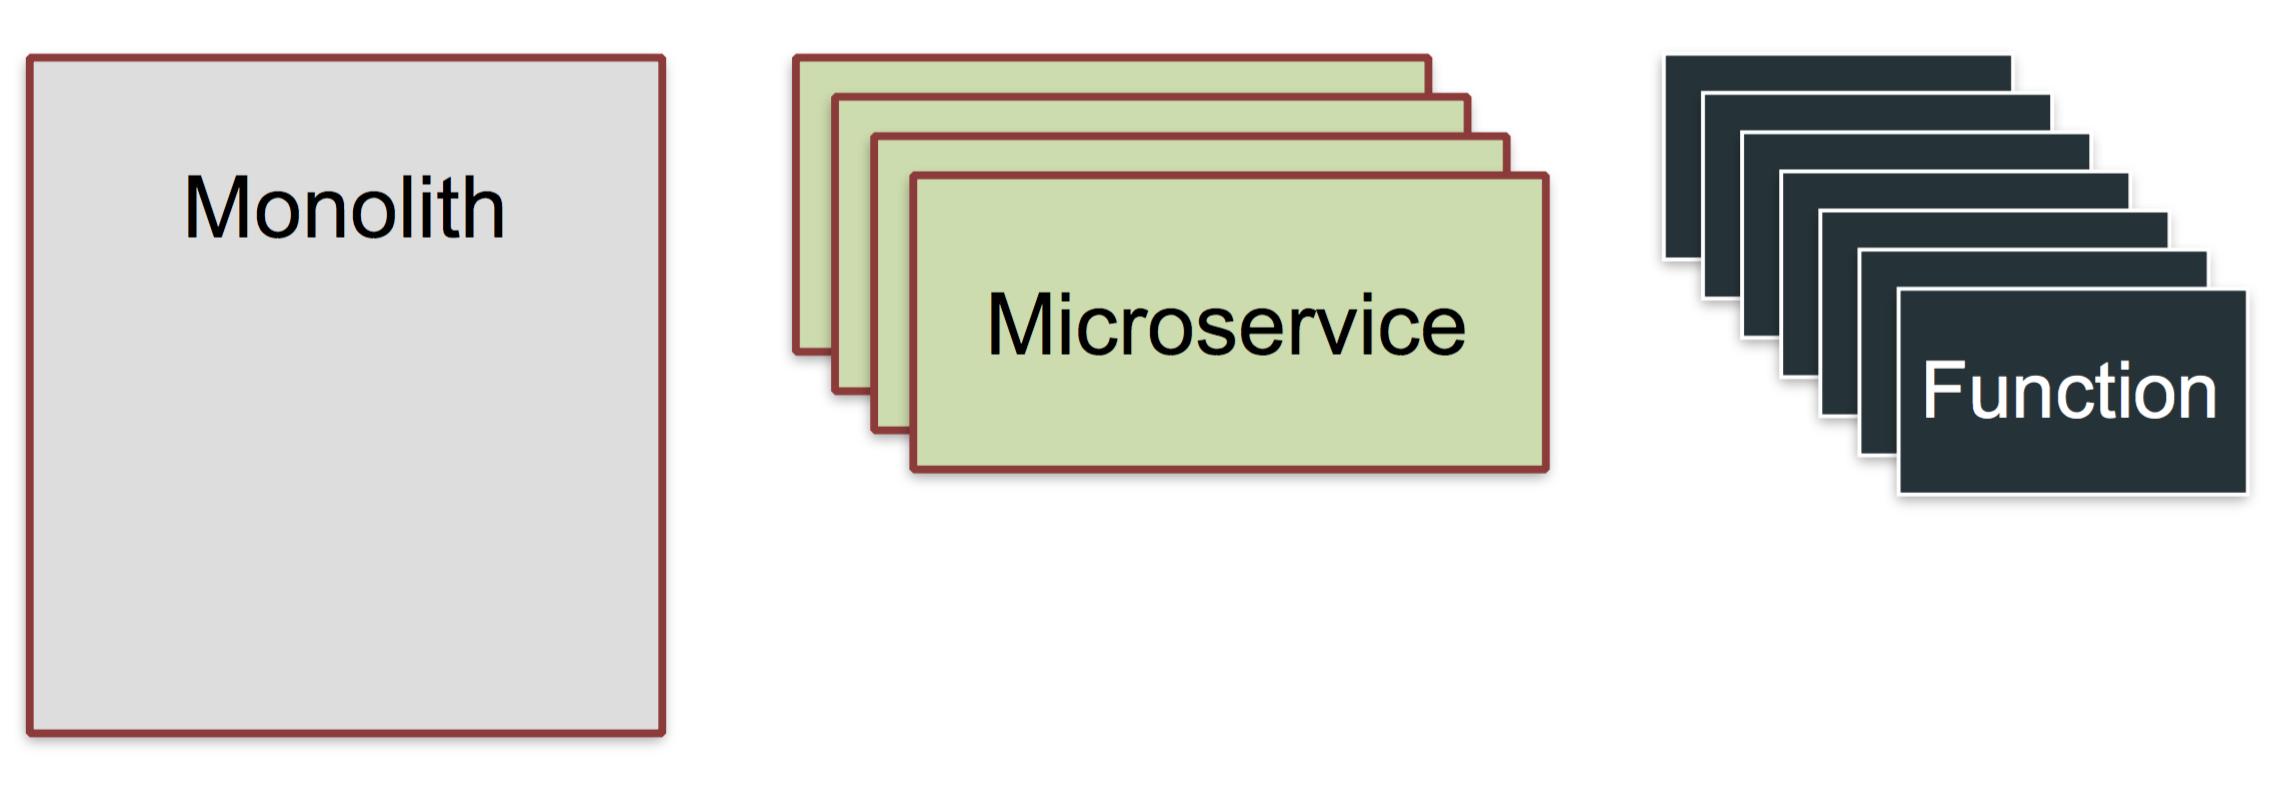 Представляя функции как сервис — OpenFaaS - 4